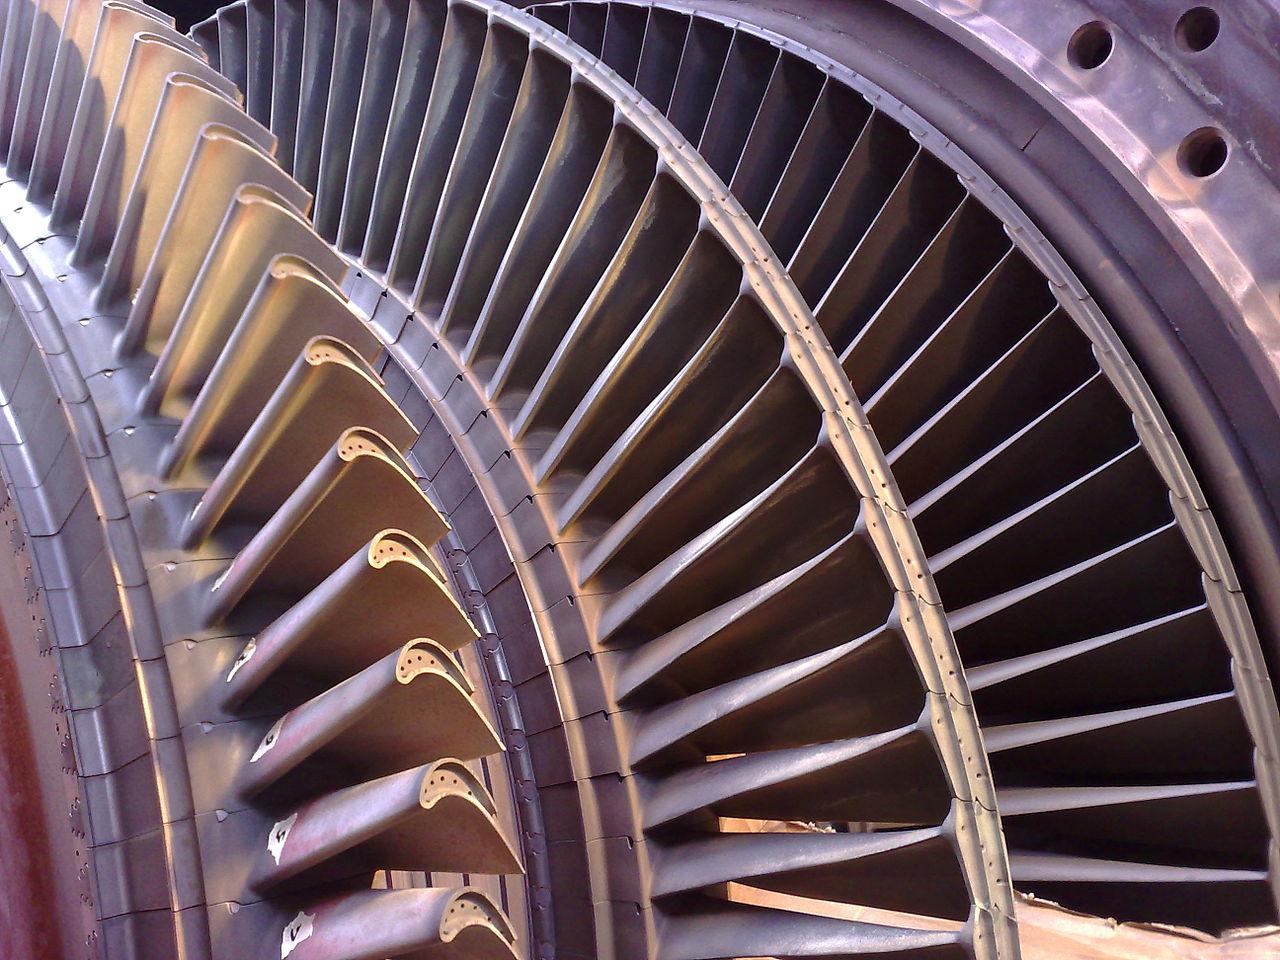 Filegas Turbine Bladejpg Wikimedia Commons